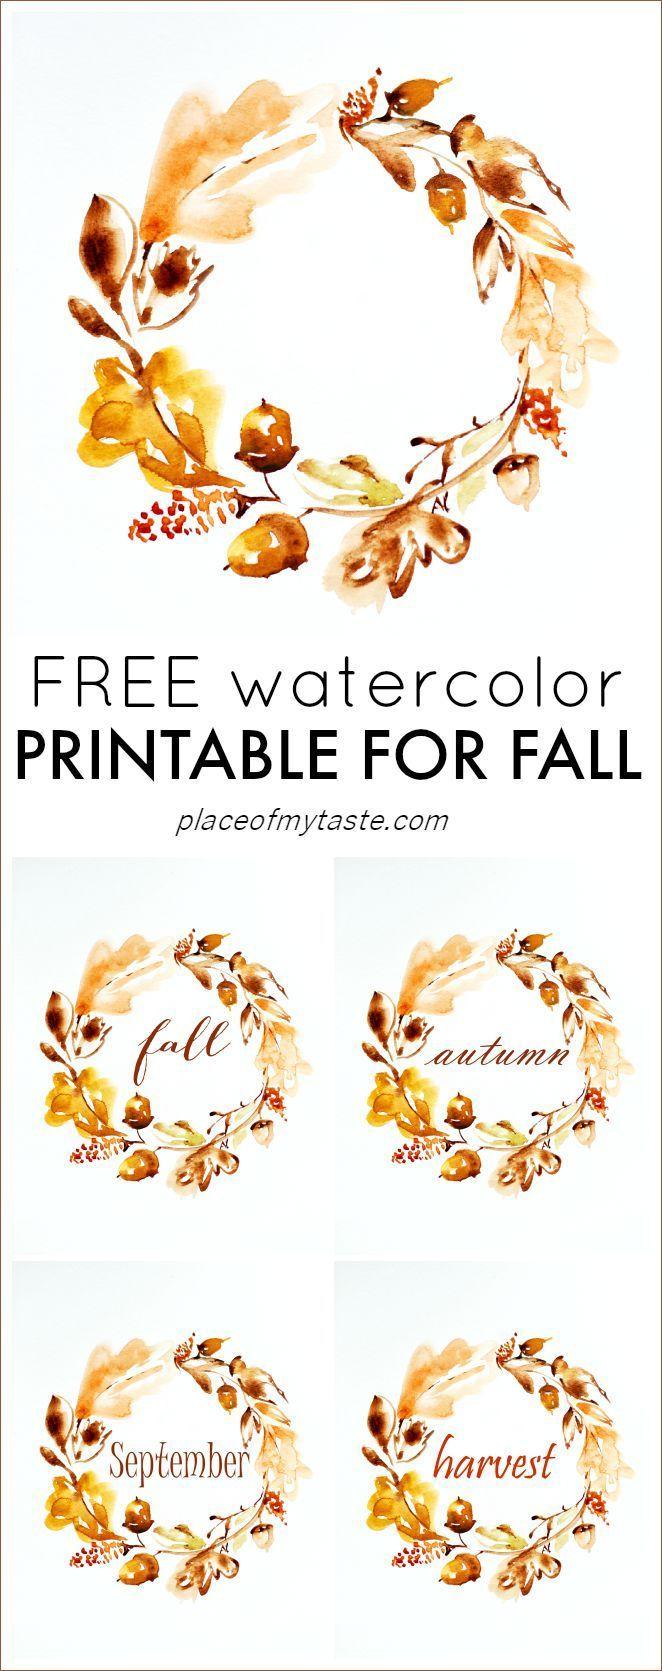 FREE WATERCOLOR FALL printable